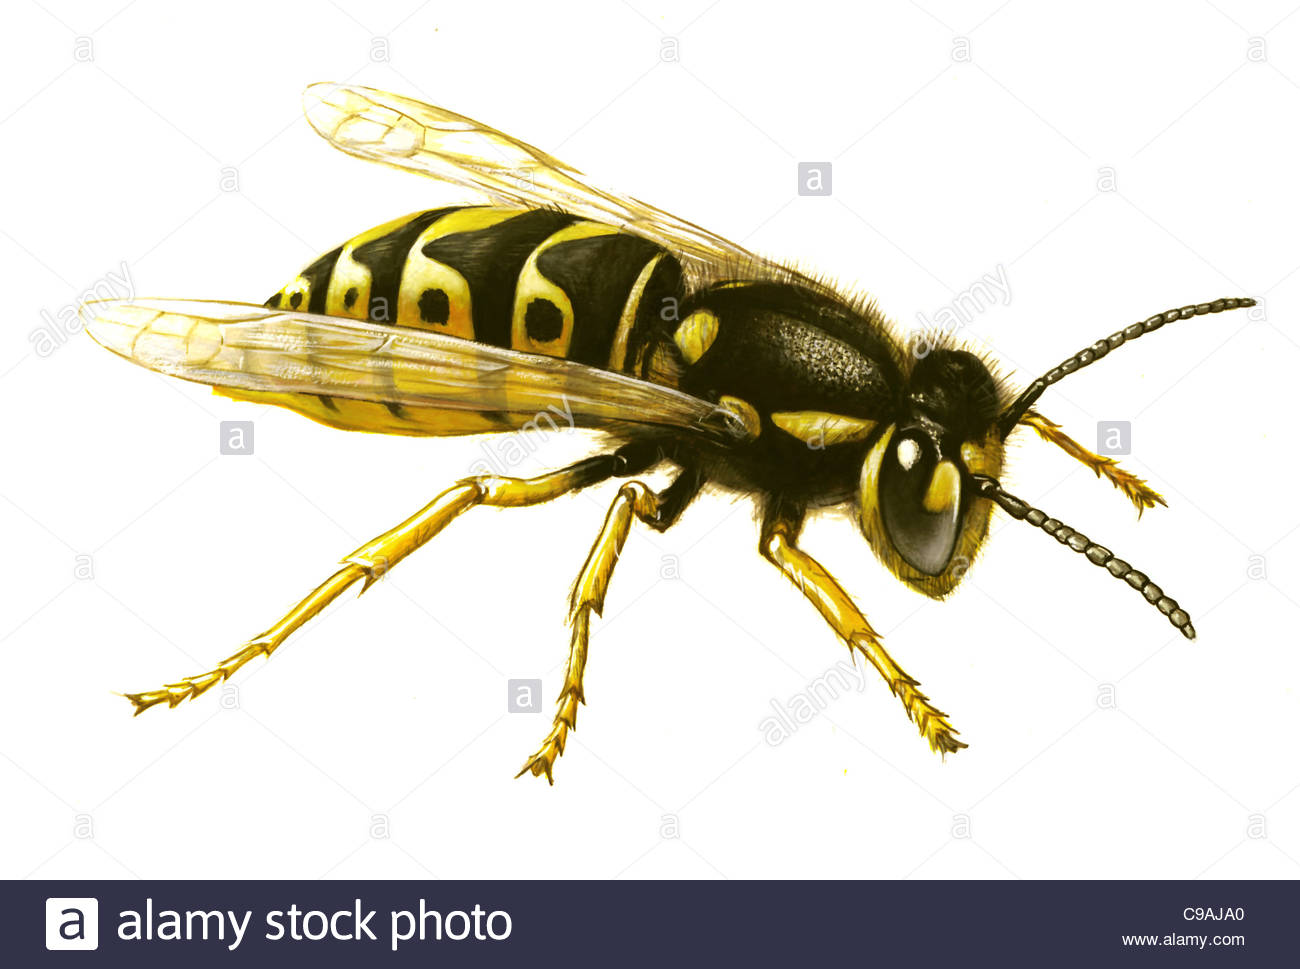 Series Schdlinge vermin German wasp Vespula germanica - Stock Image